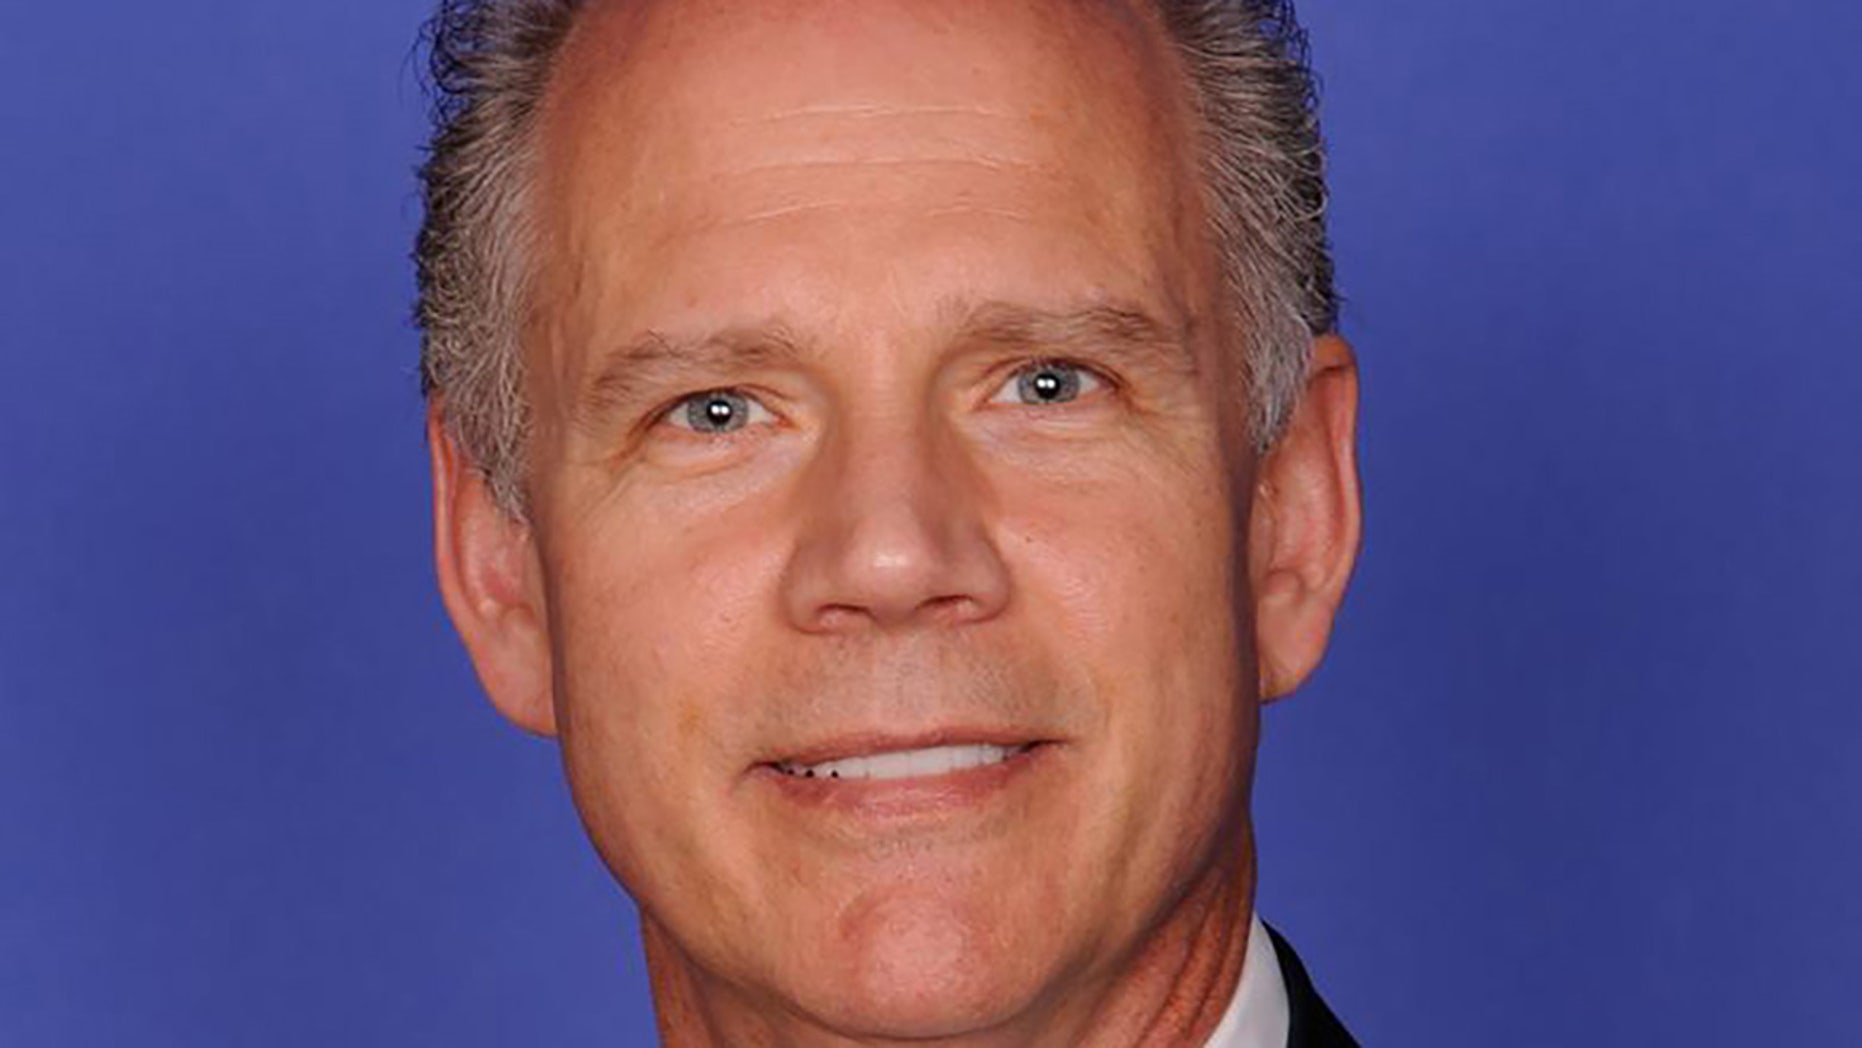 U.S. Rep. Dan Donovan, R-N.Y.